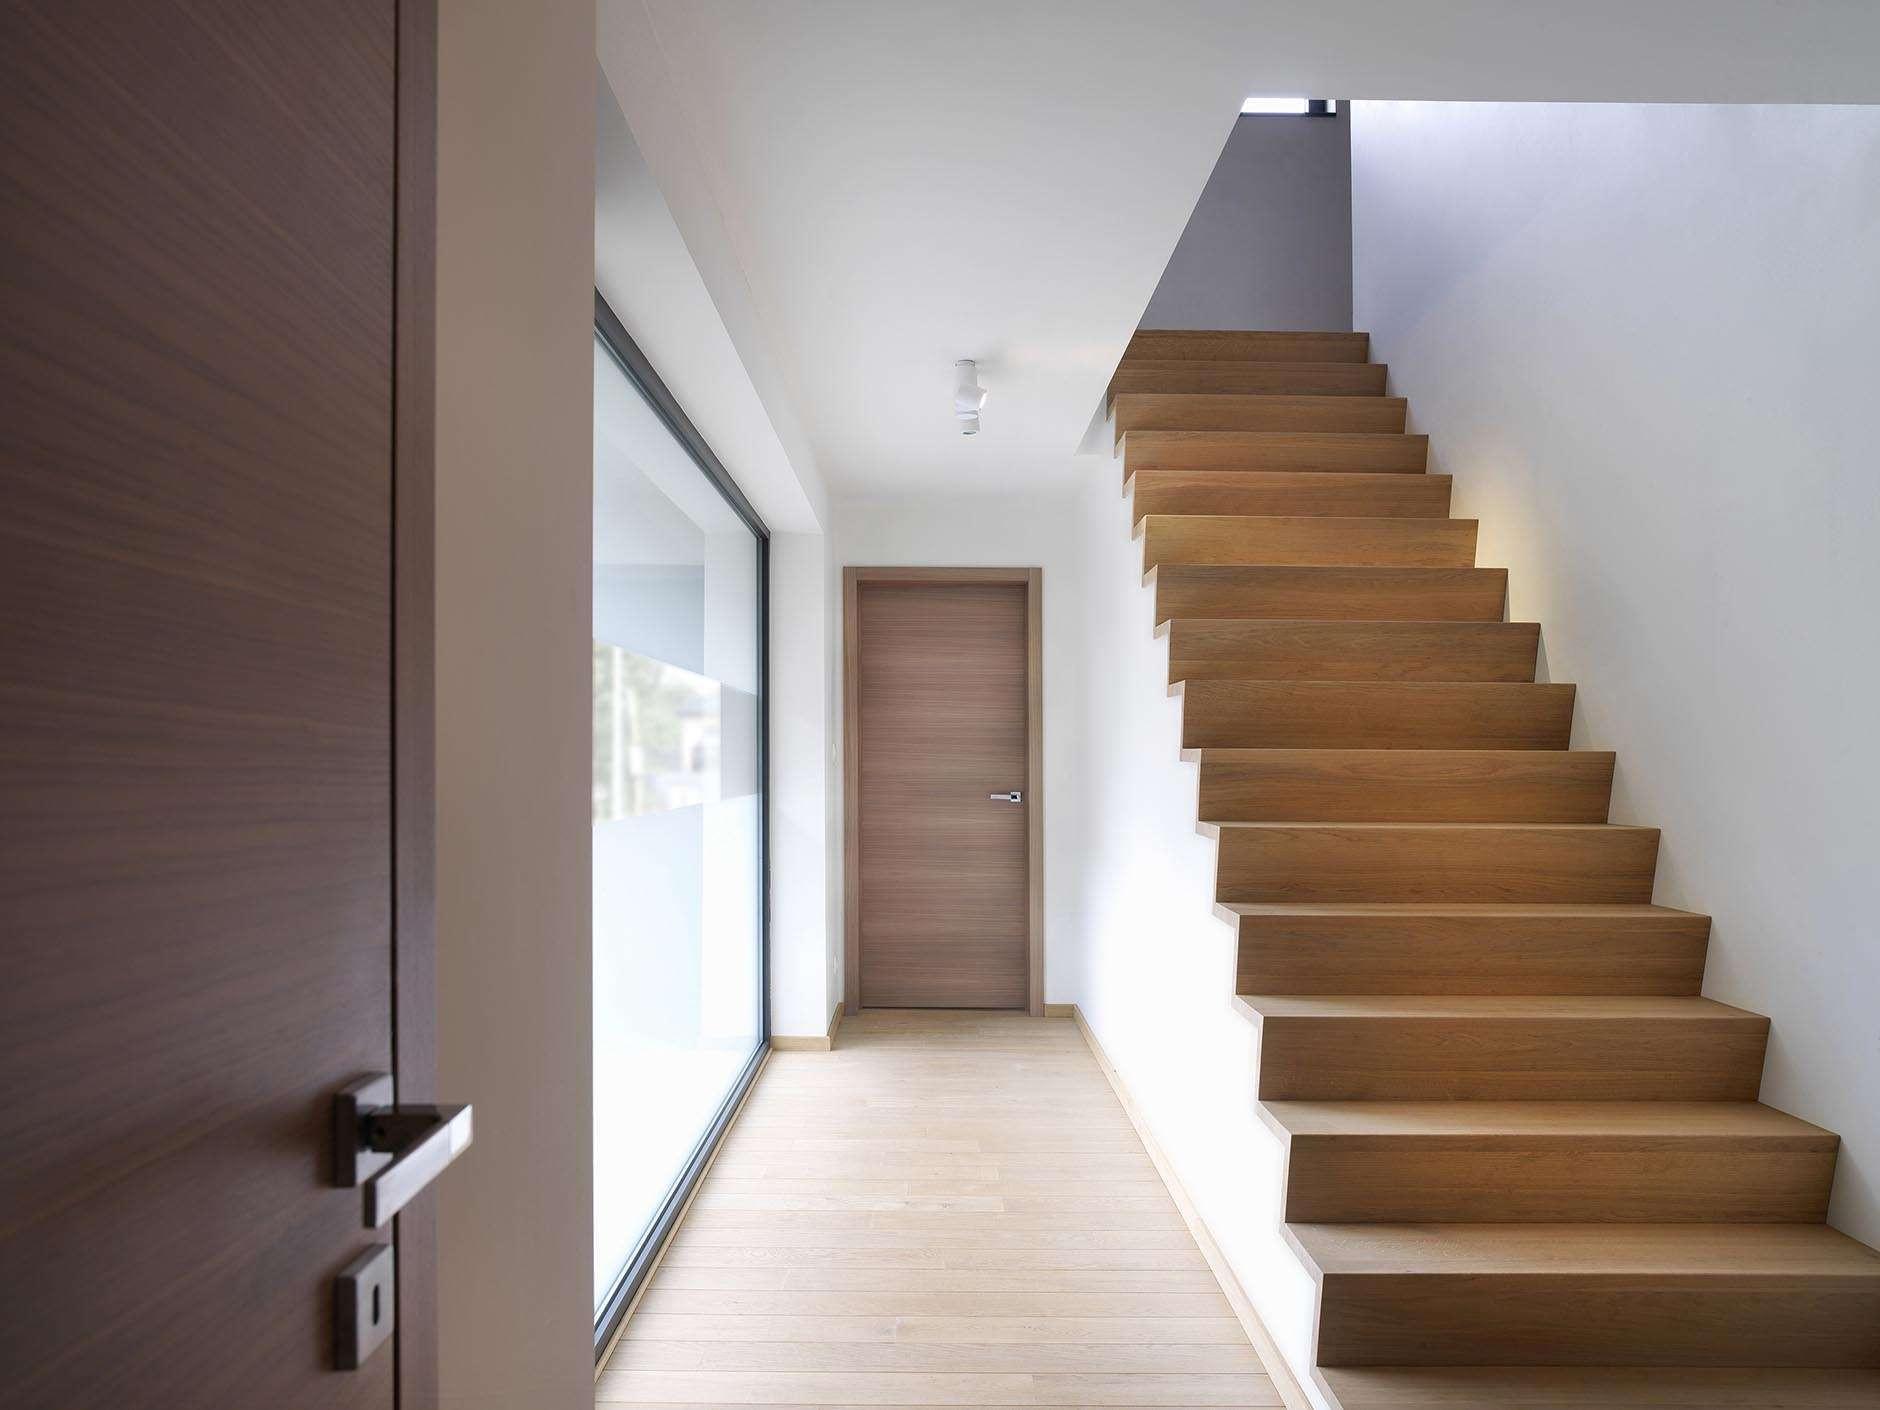 Nordex-binnendeuren-trap-hout